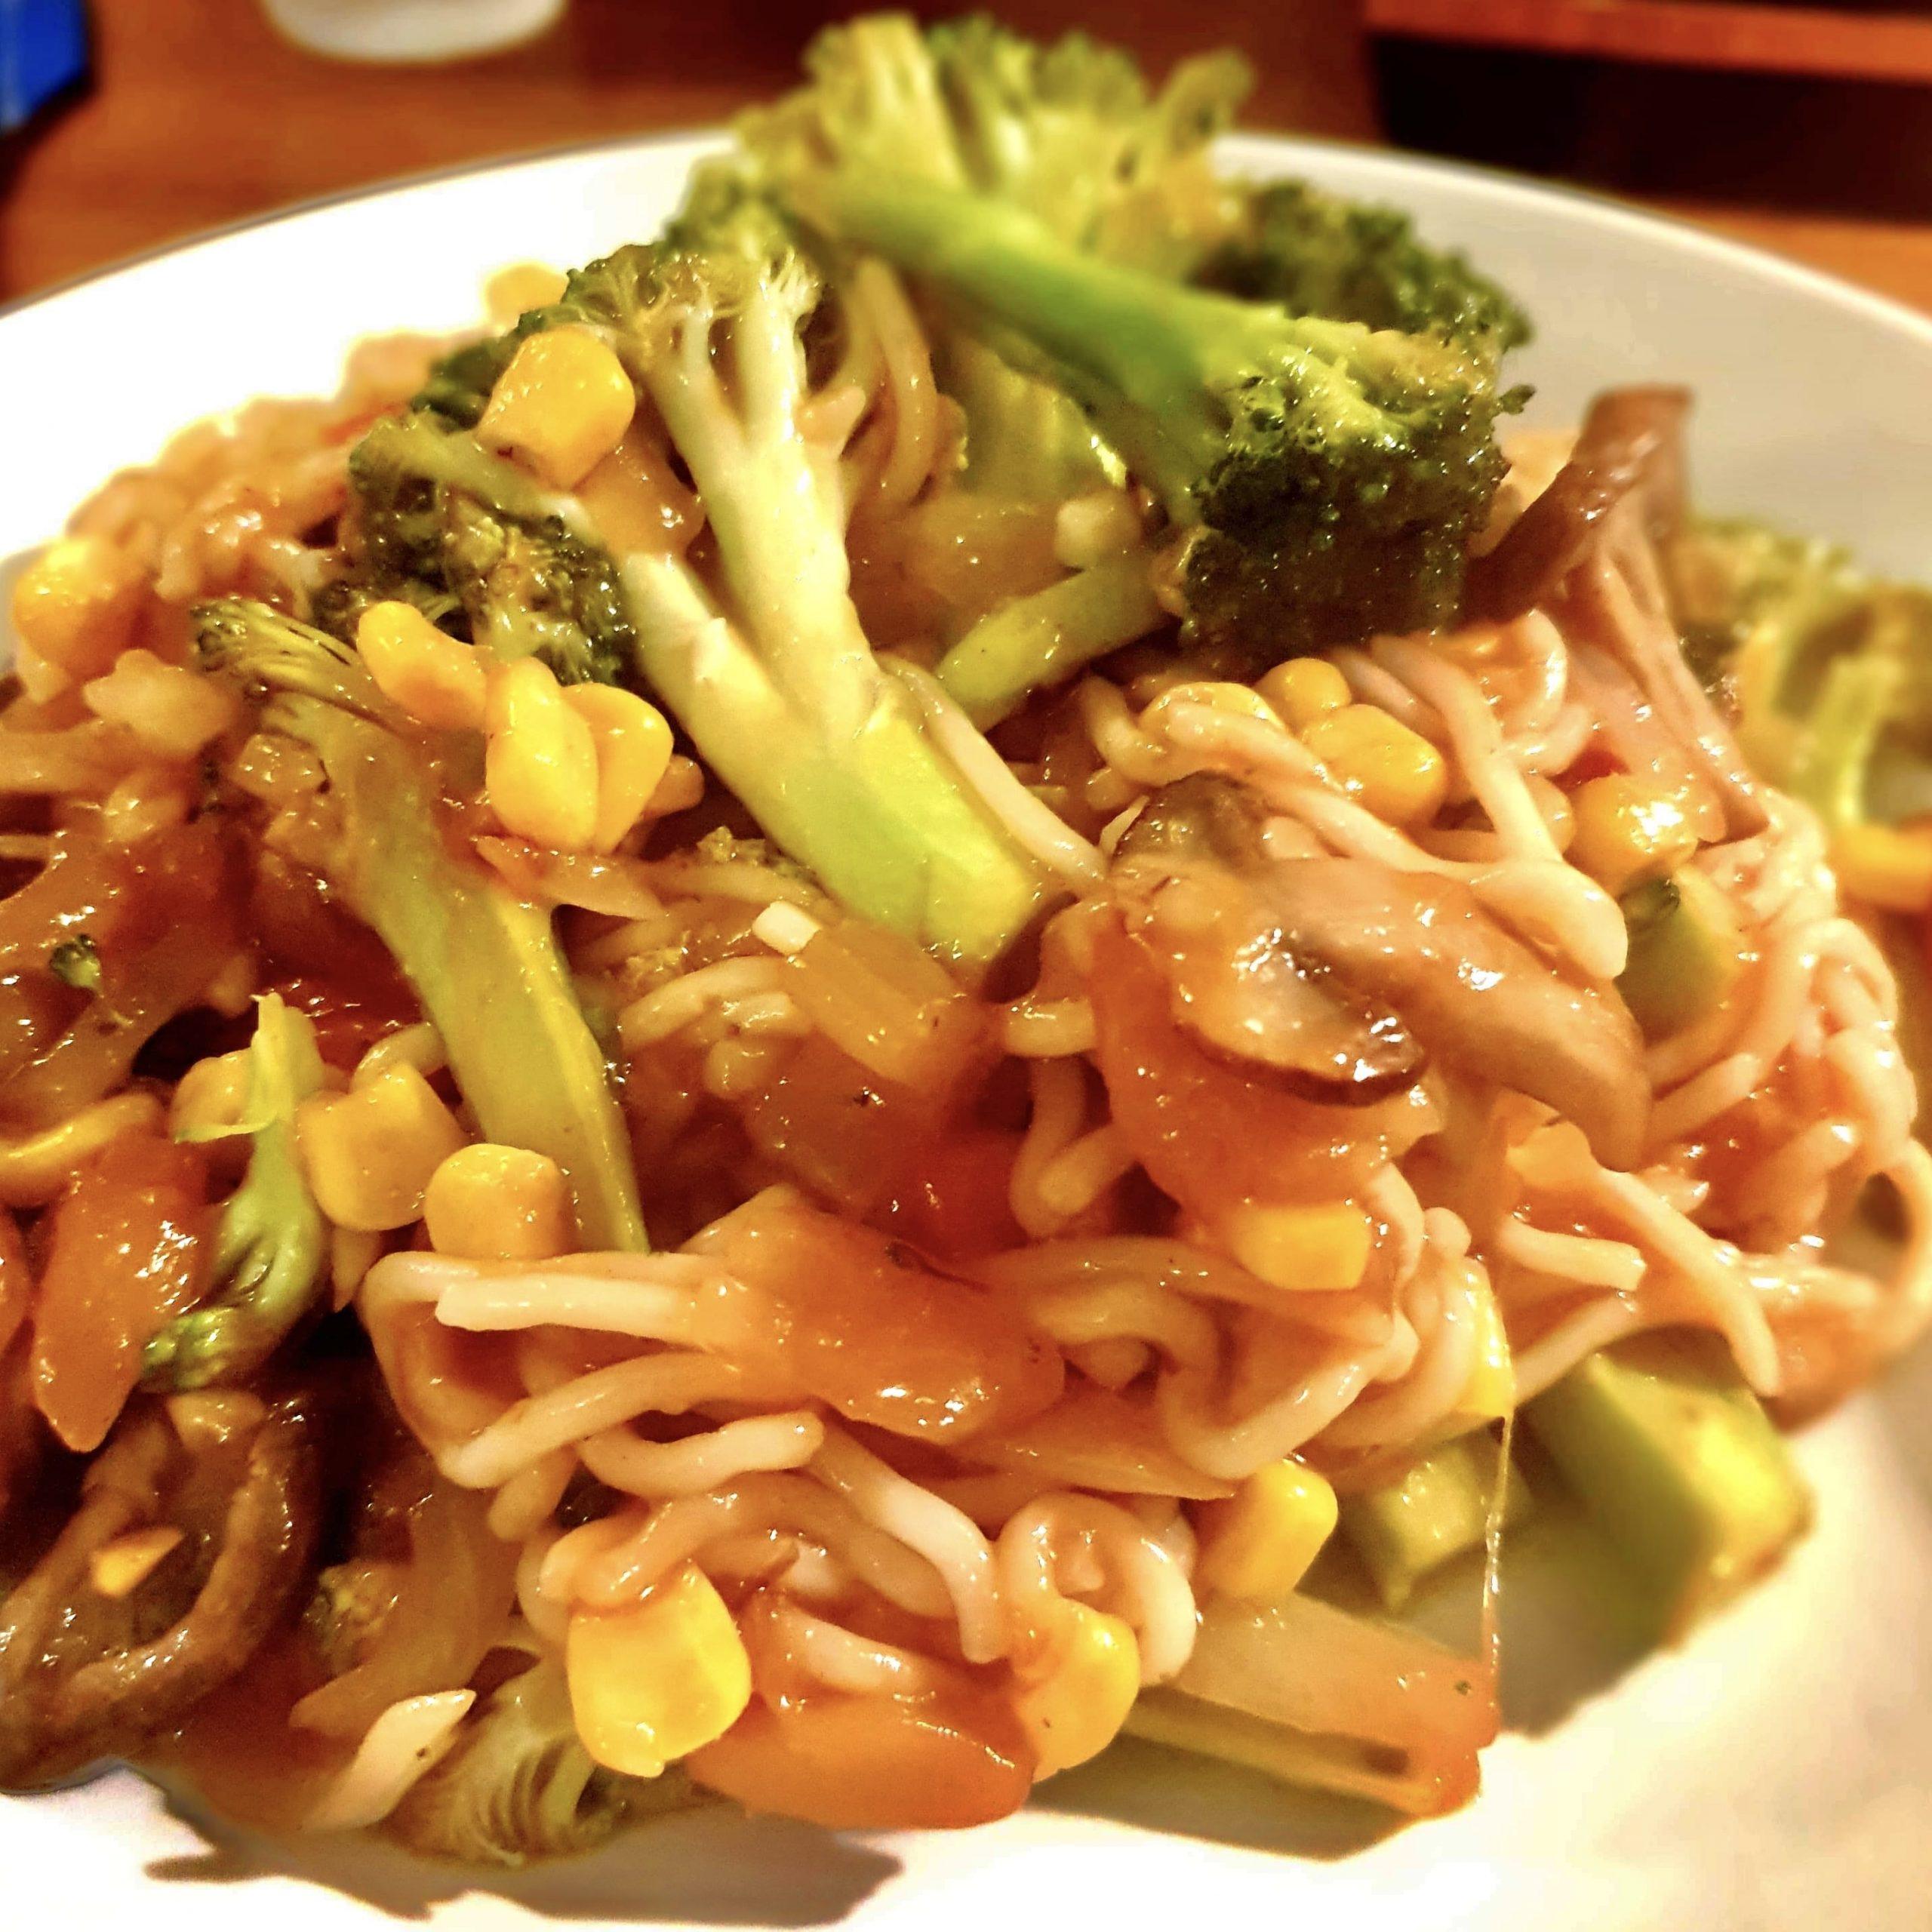 Vegan Asian Stir Fry